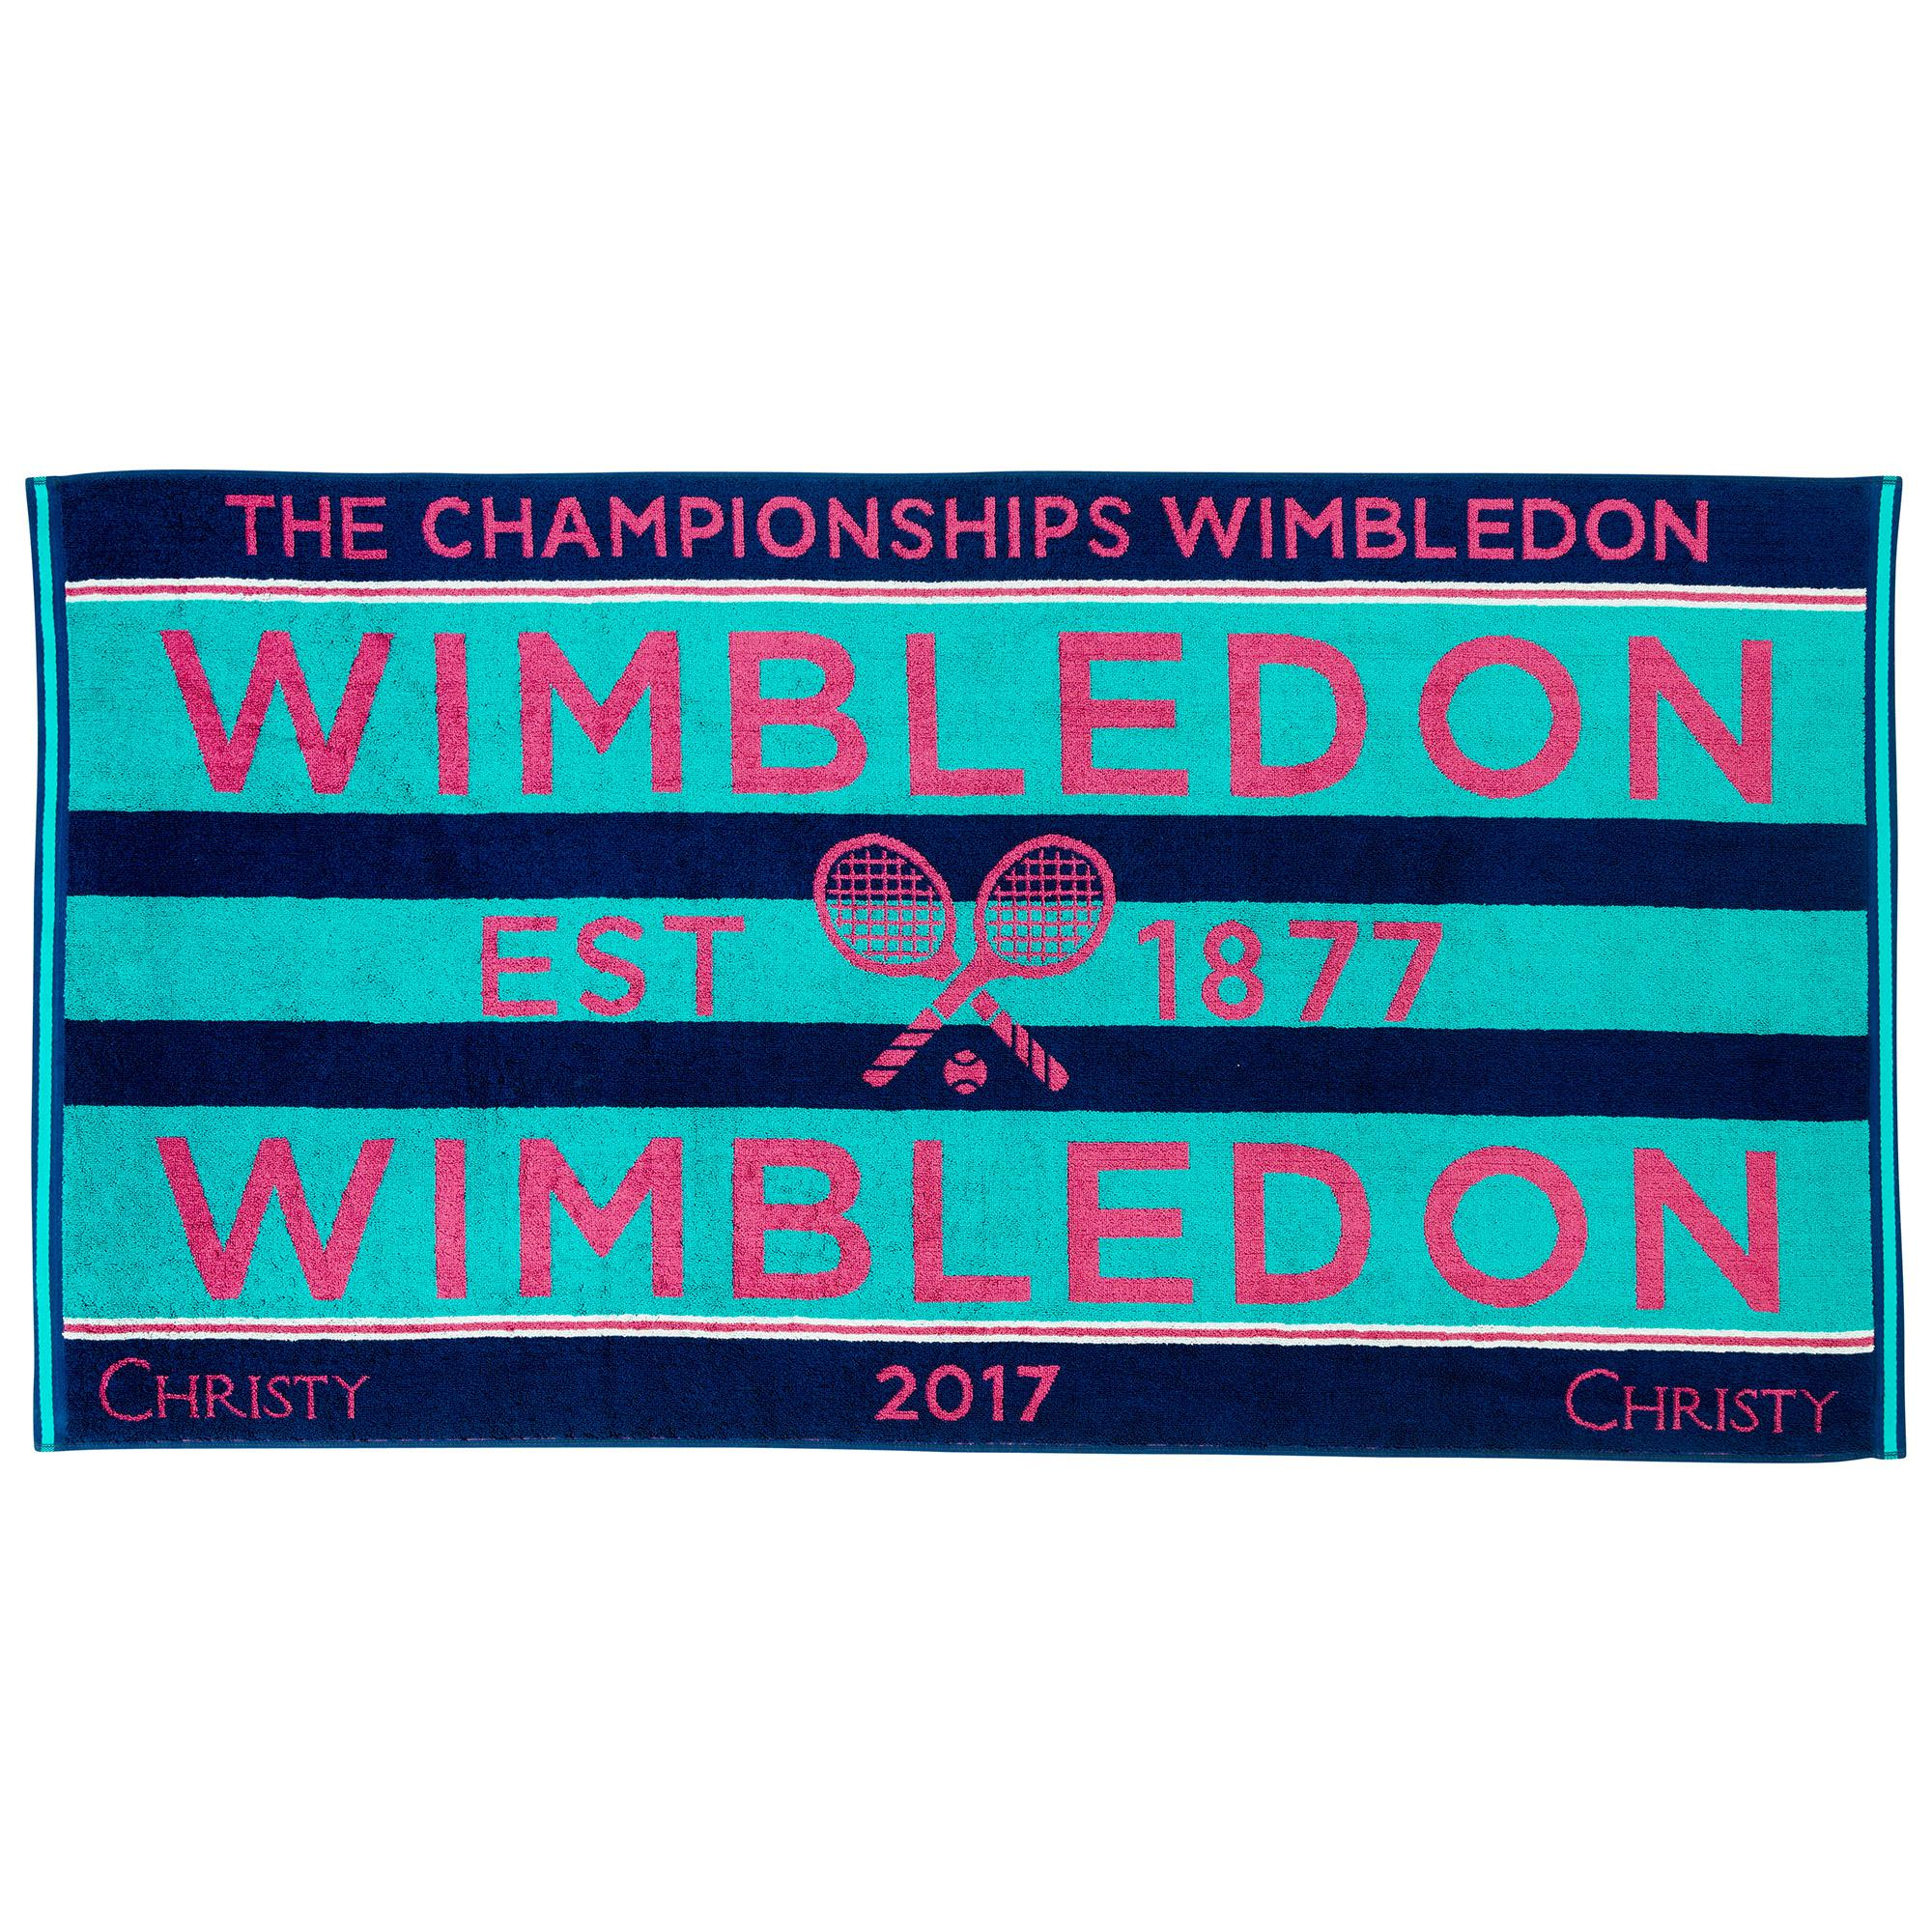 2017 Wimbledon Finals Brackets Back To The Future: Christy Wimbledon 2017 Championships Towel